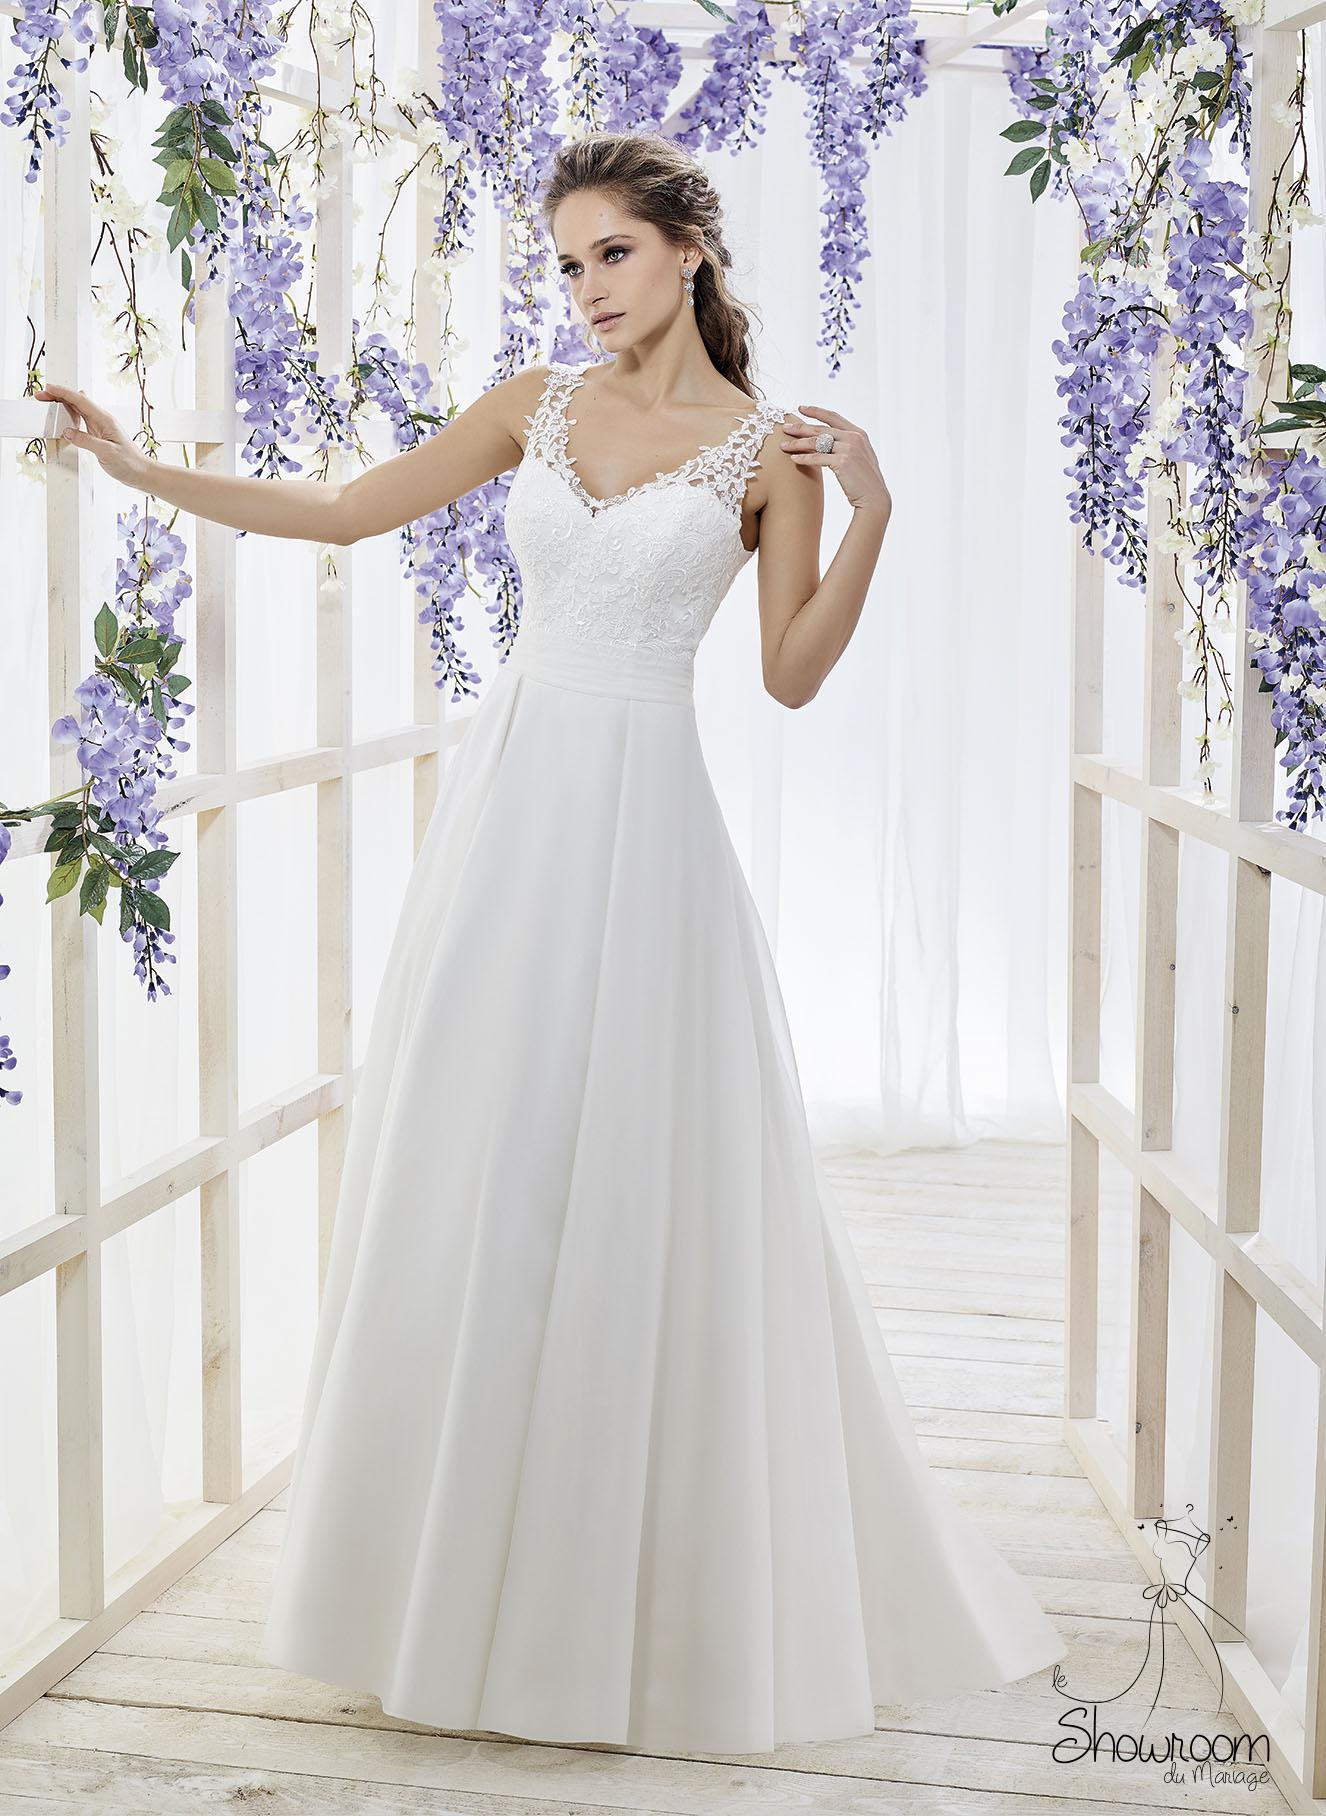 Robes de mariée 205-30